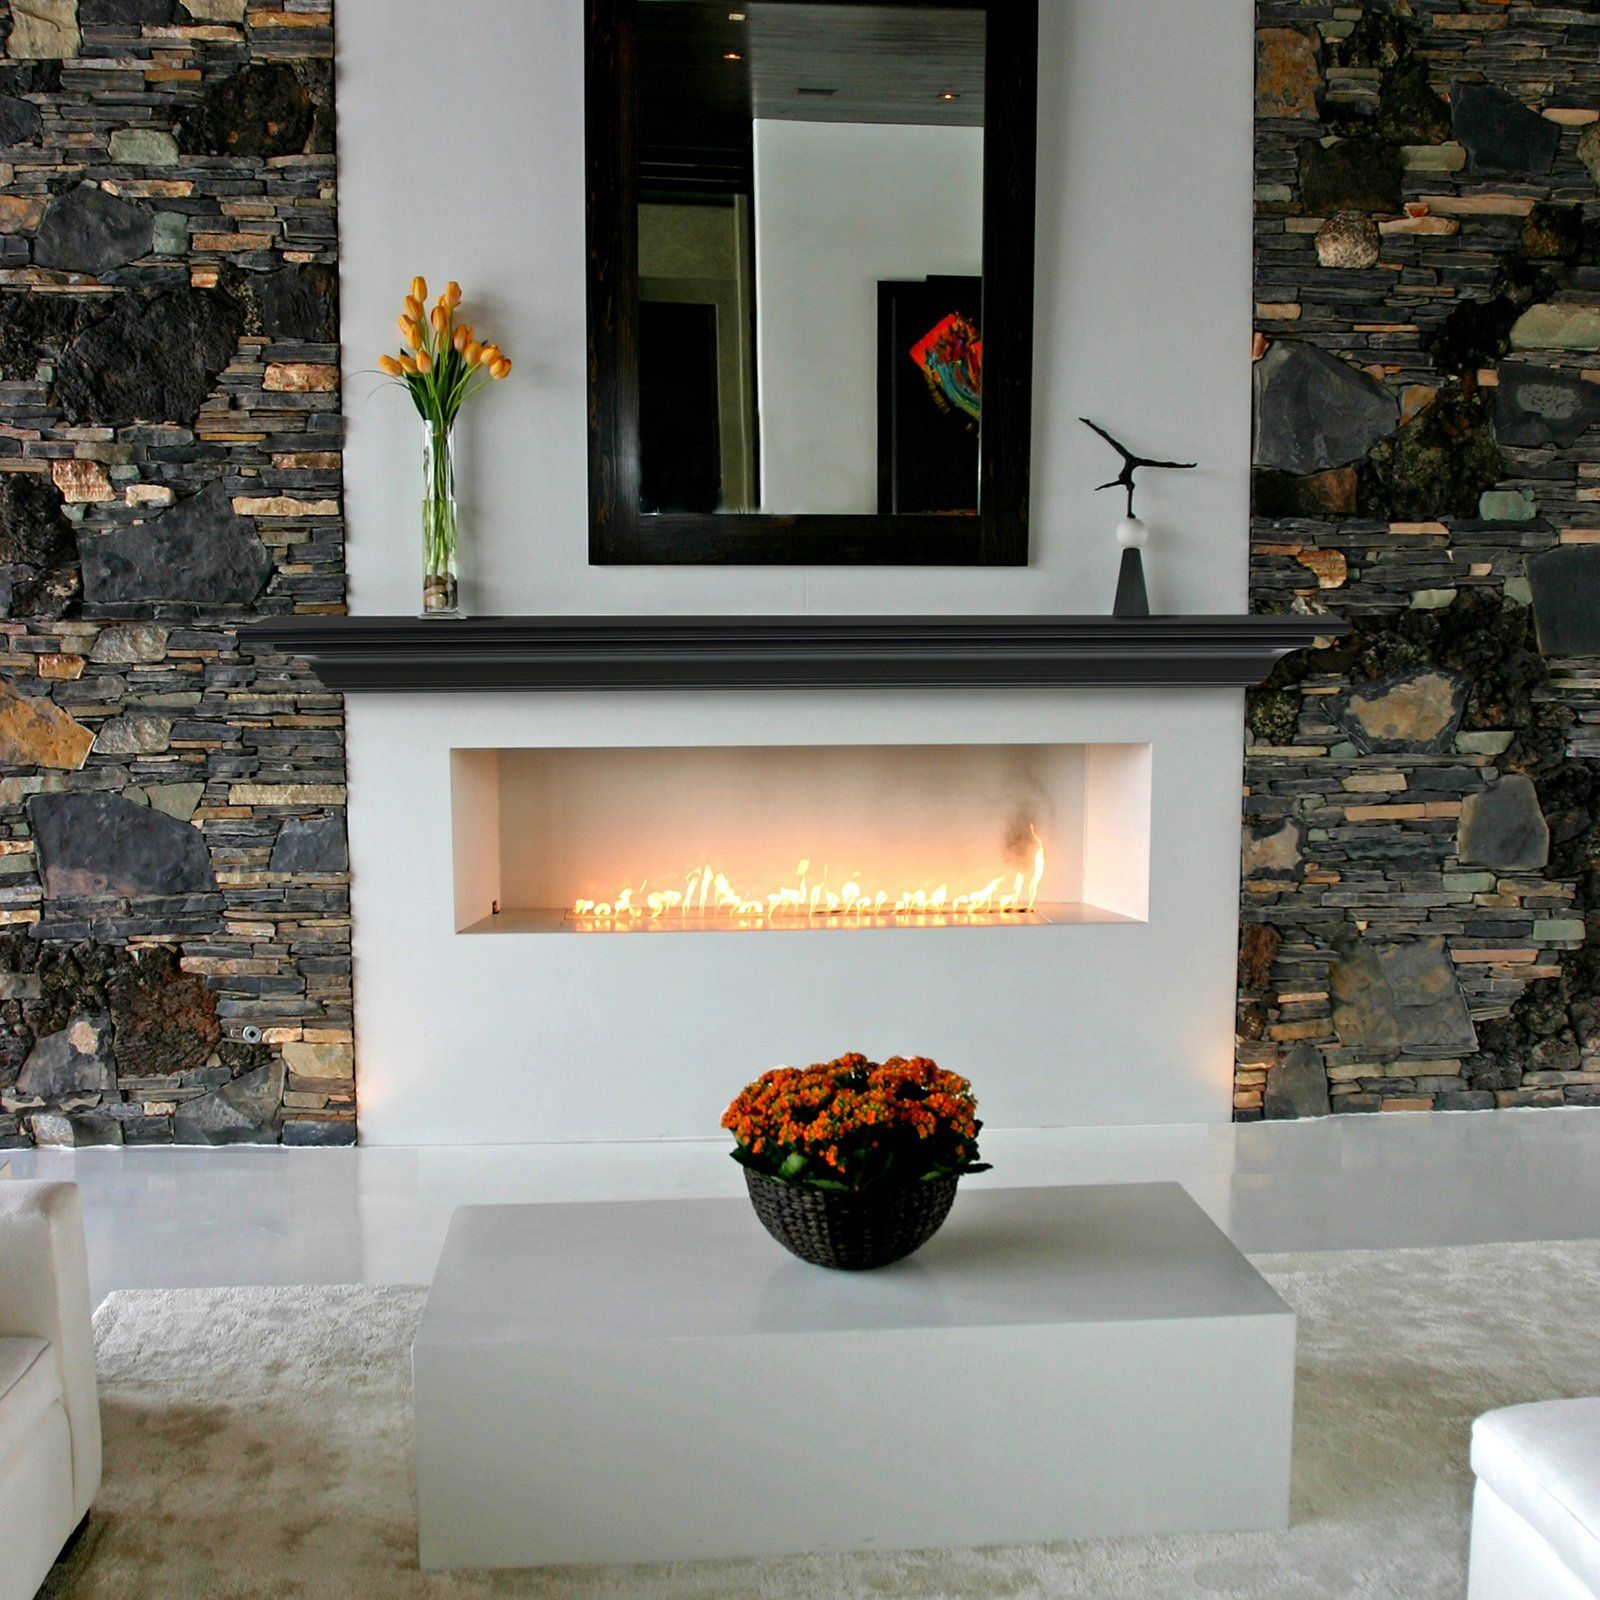 Pearl Mantels Crestwood Transitional Fireplace Mantel Shelf - $109.98  @hayneedle